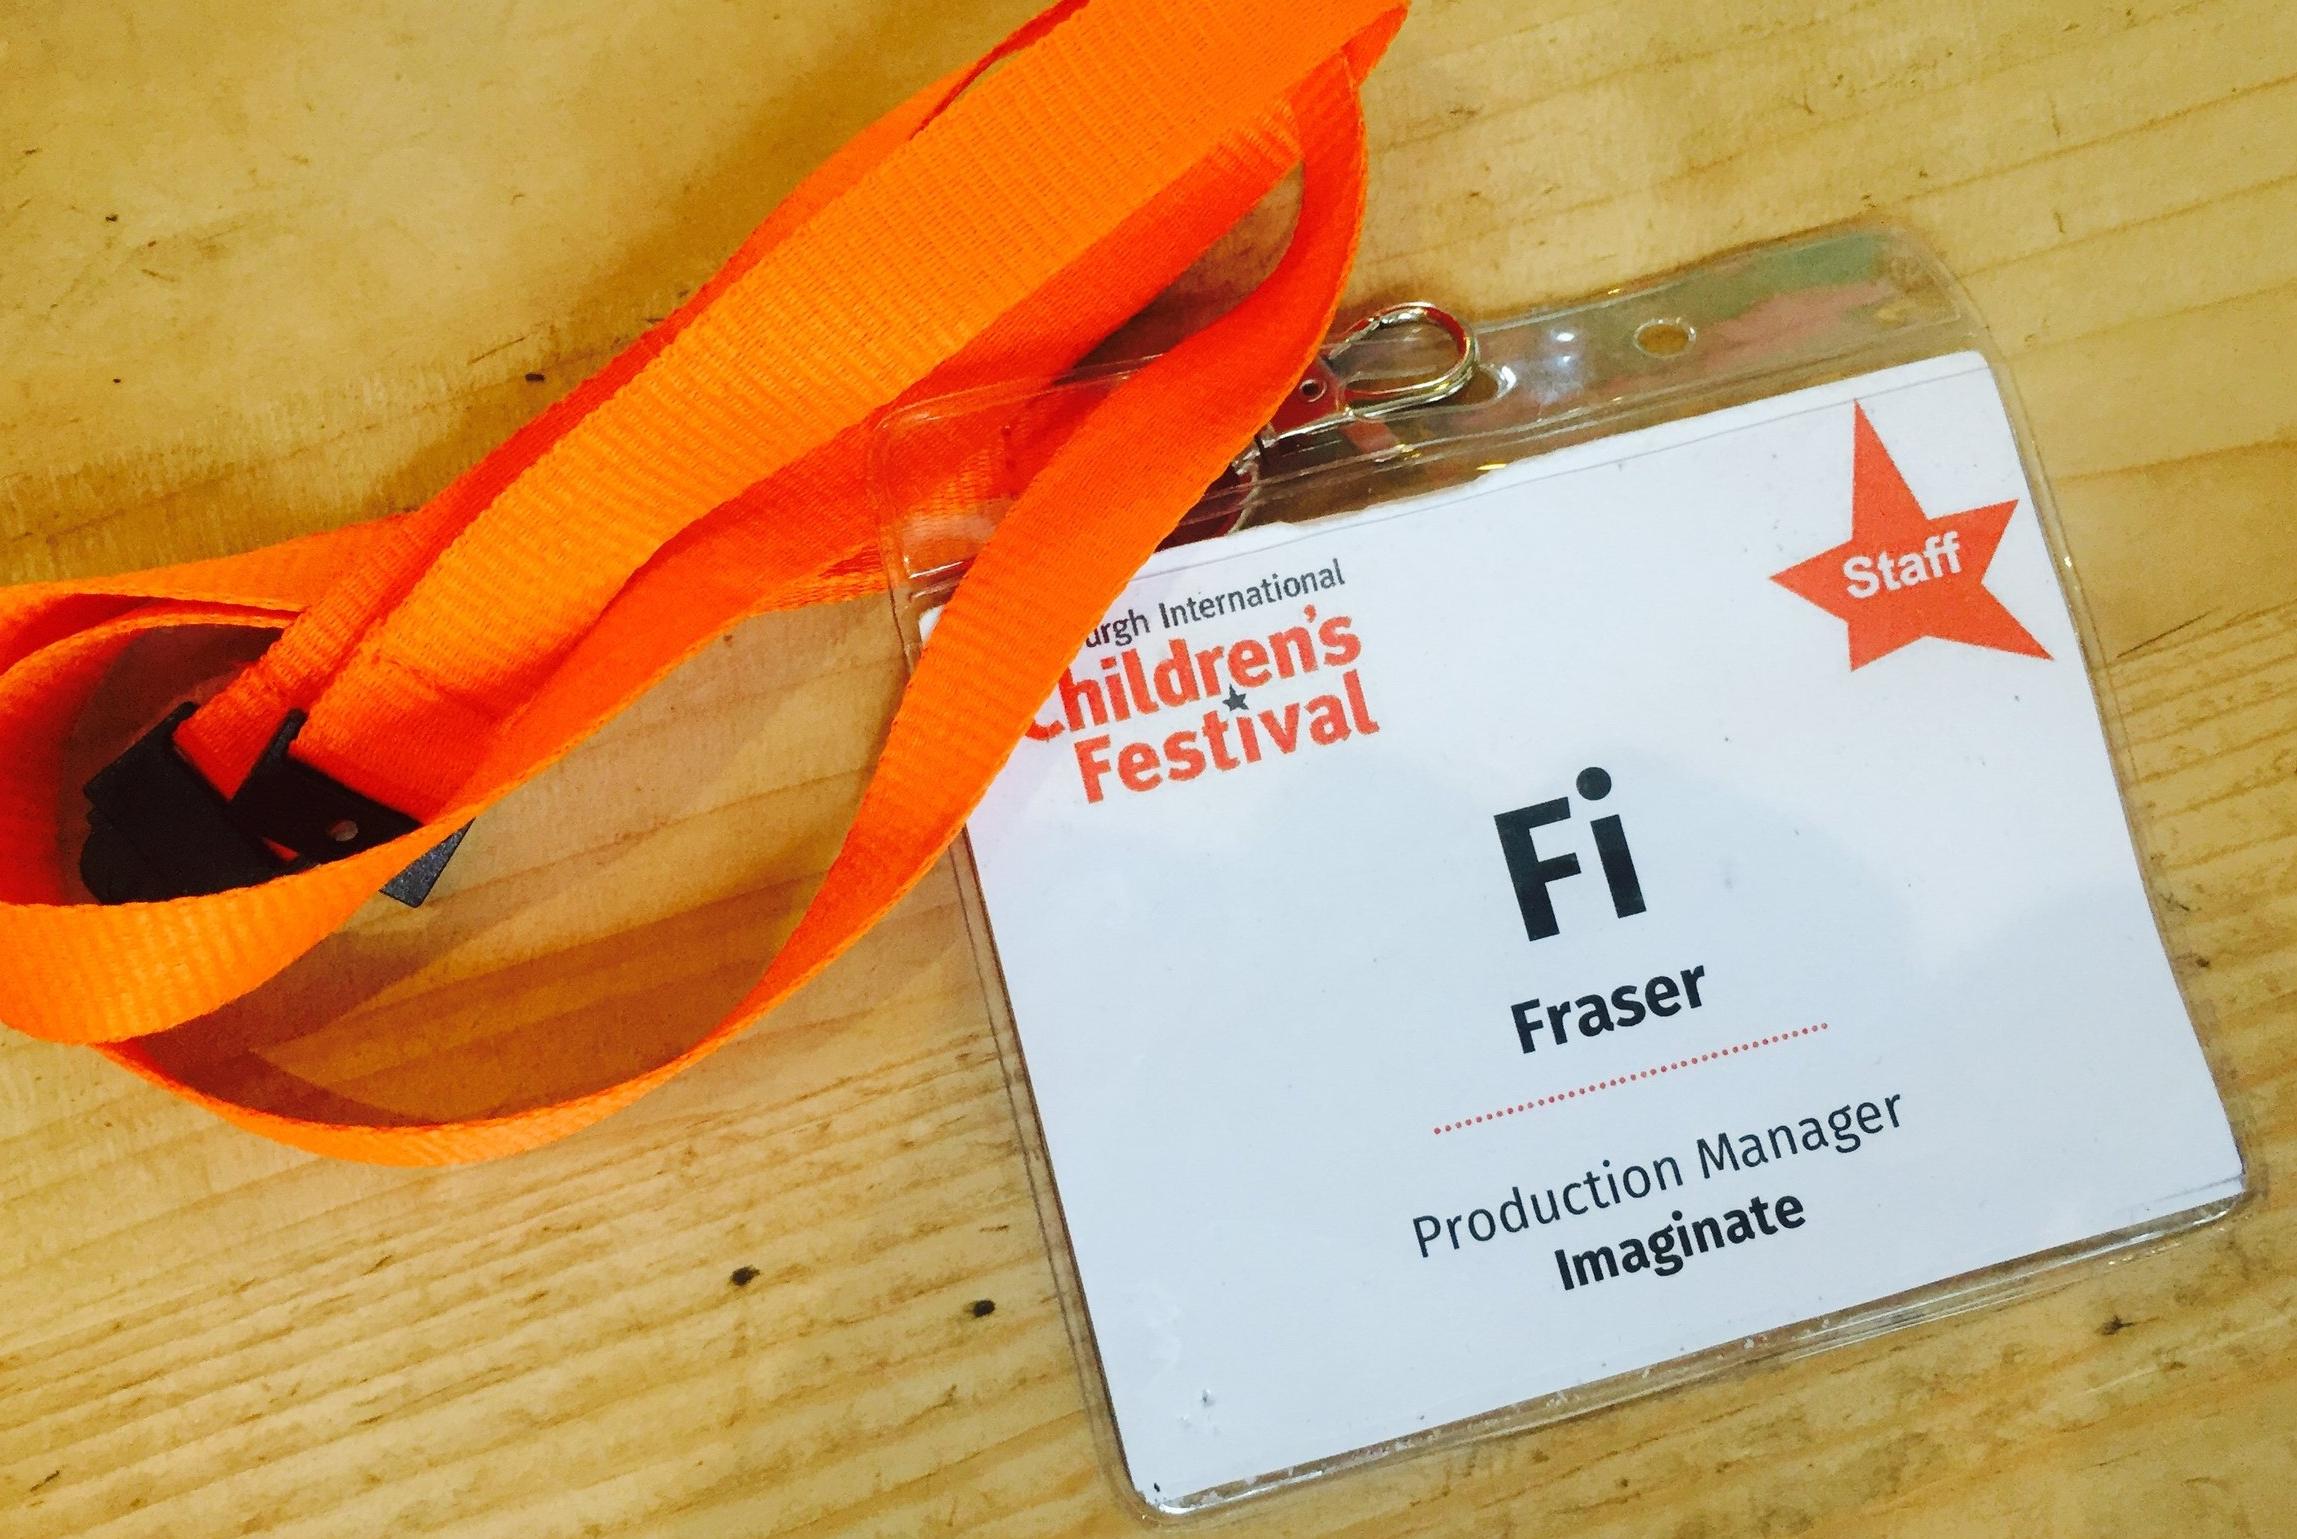 Edinburgh International Childrens Festival 2018